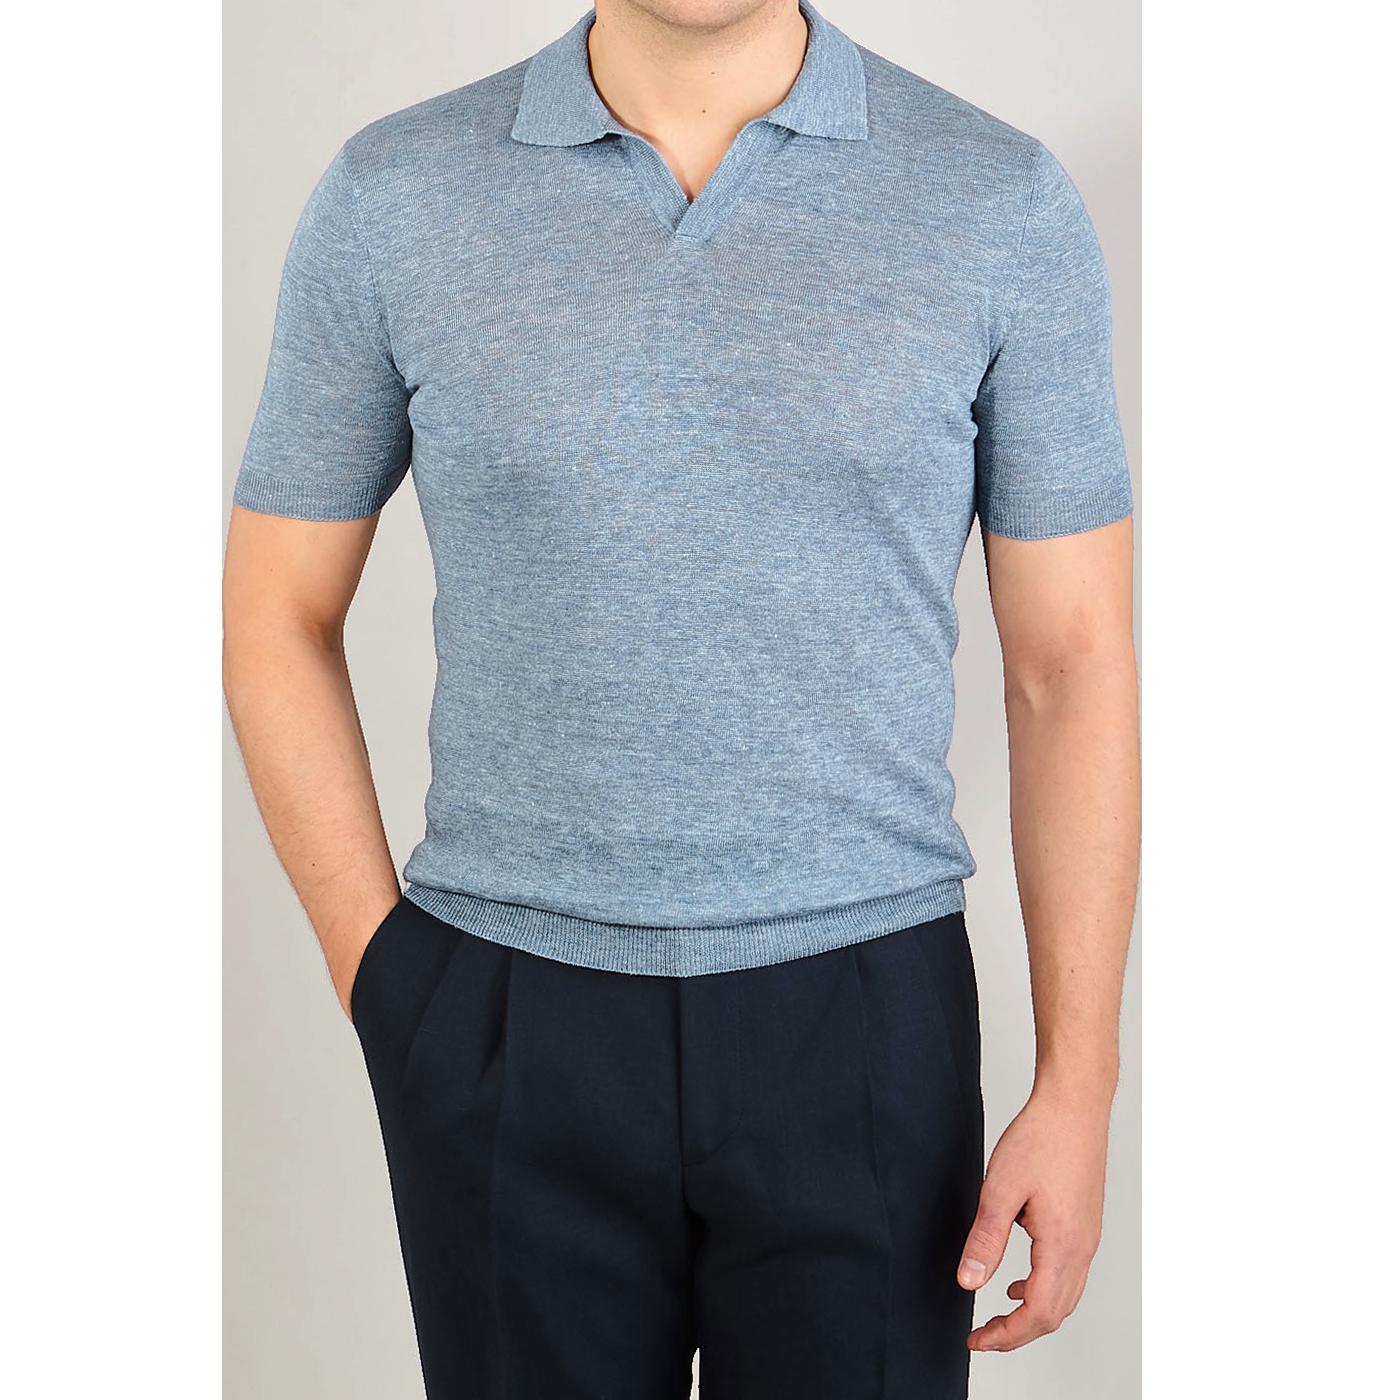 Gran Sasso Sky Blue Melange Capri Collar Linen Polo Shirt Front